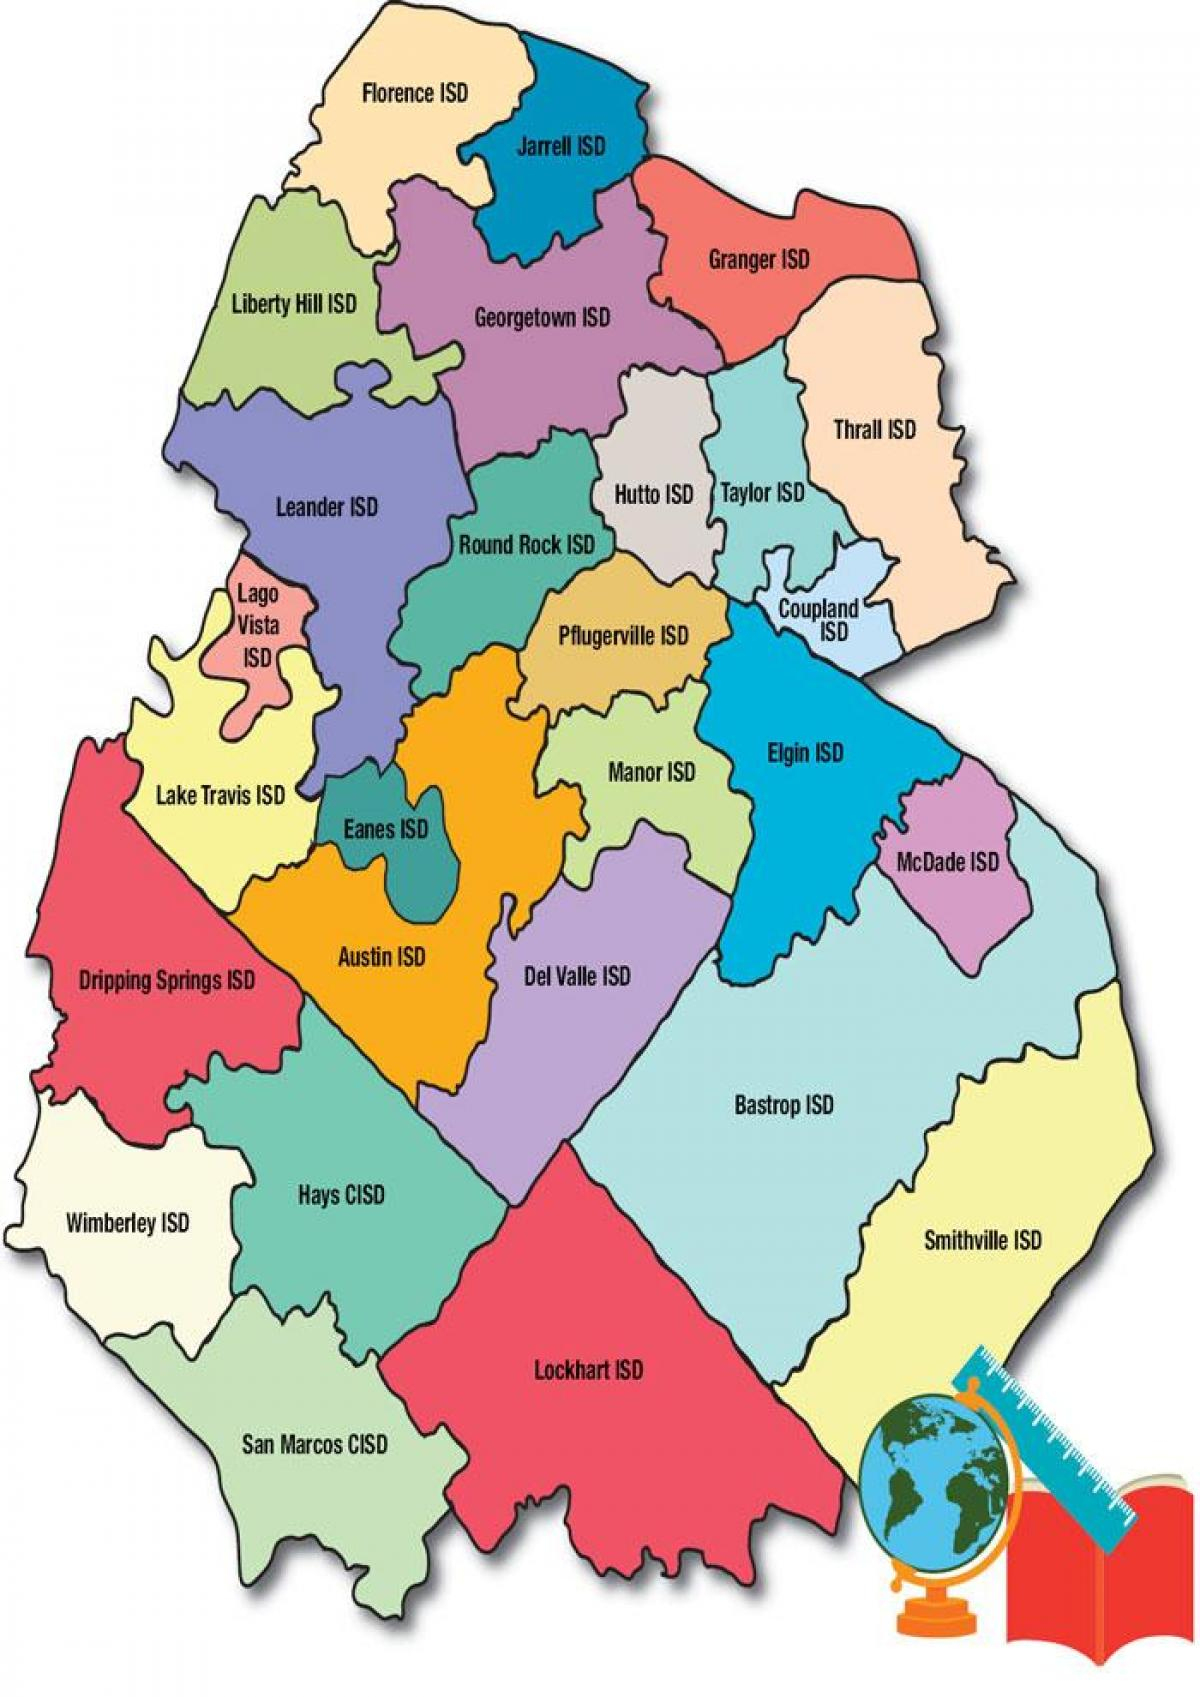 Austin School Districts Map - School District Map Austin (Texas - Usa) - Texas School District Map